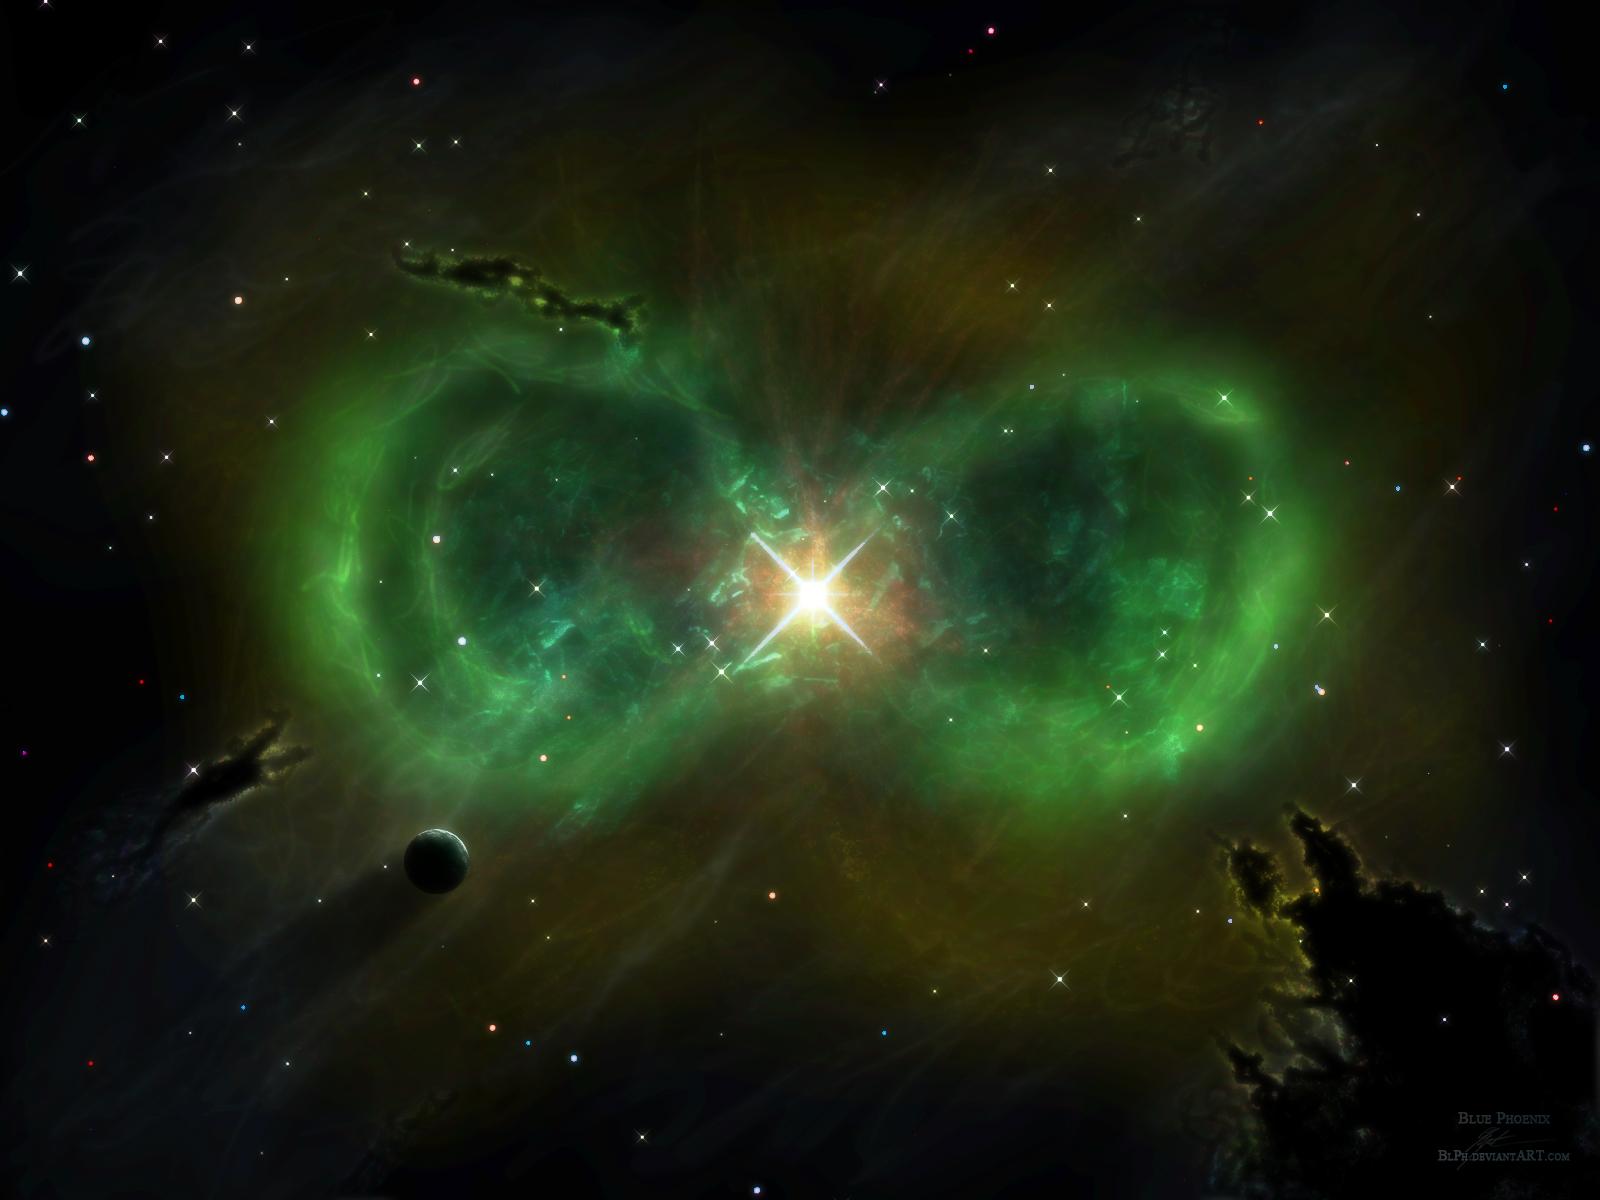 infinity_nebula_by_blph-d37yigj.jpg (1600×1200)